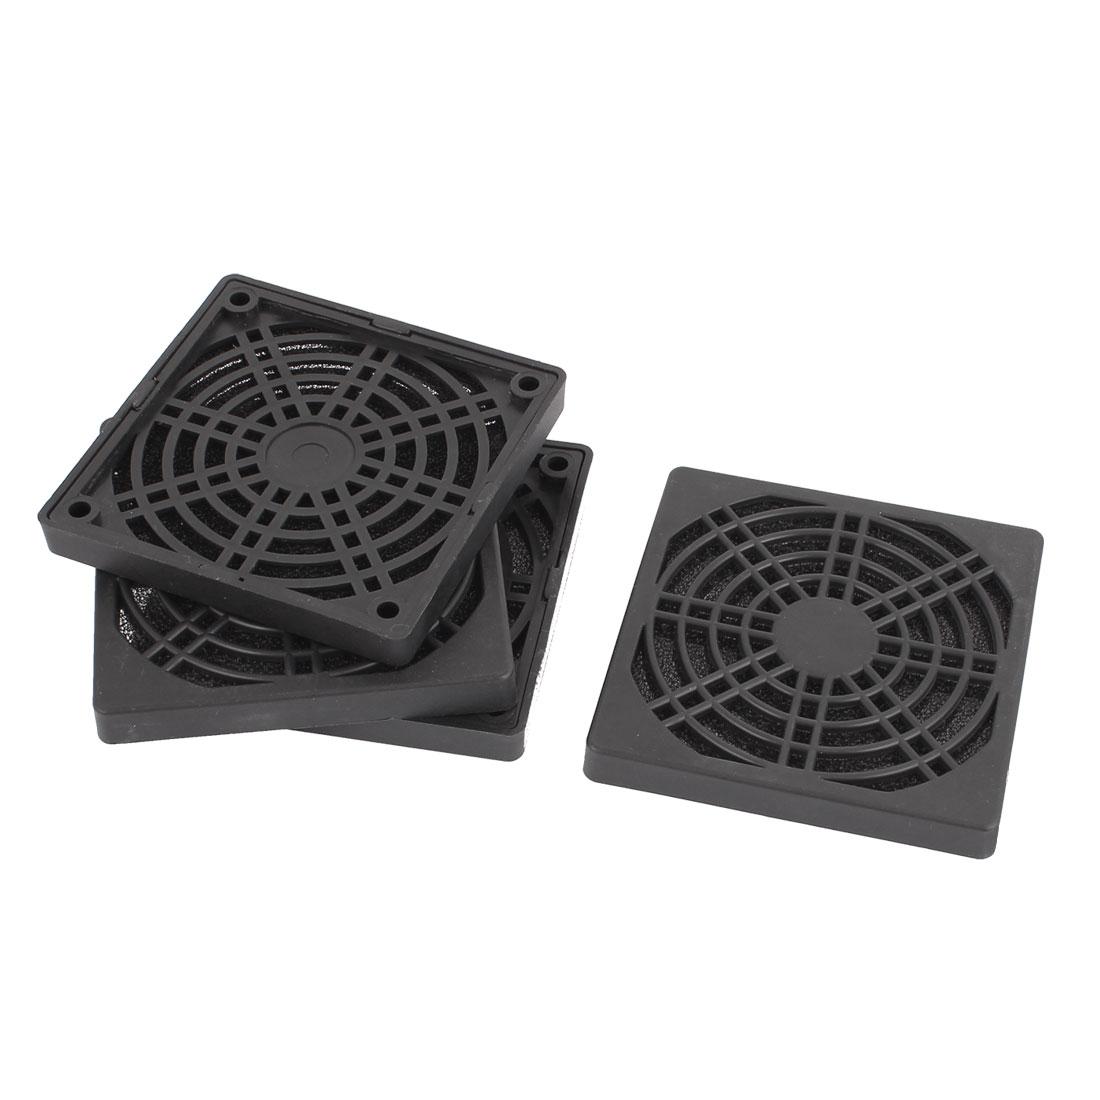 4 Pcs Computer Case Fan Dustproof Mesh Dust Filter Cover Guard 86x86x10mm